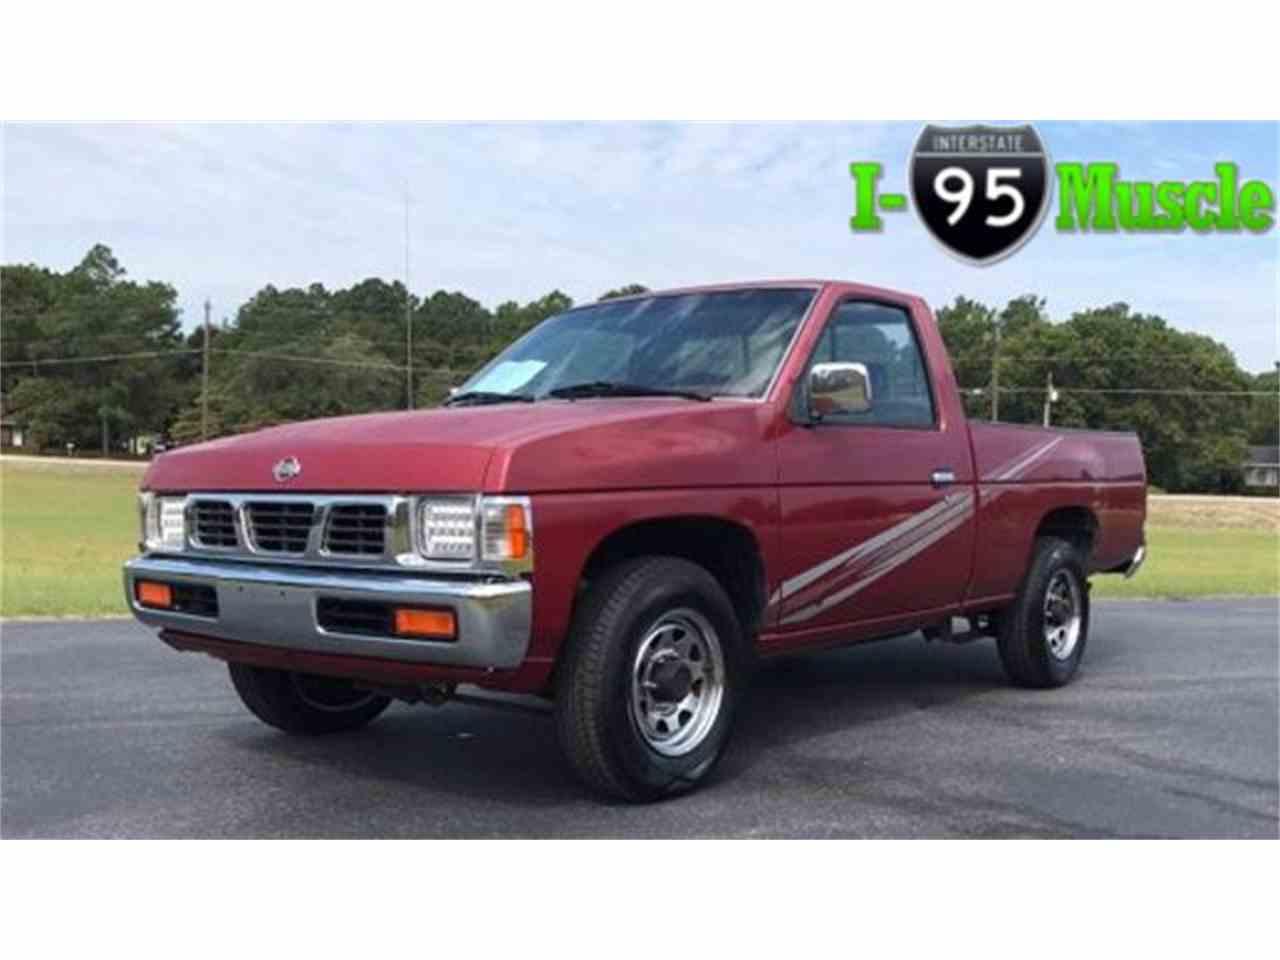 1993 Nissan Hardbody for Sale - CC-1042159